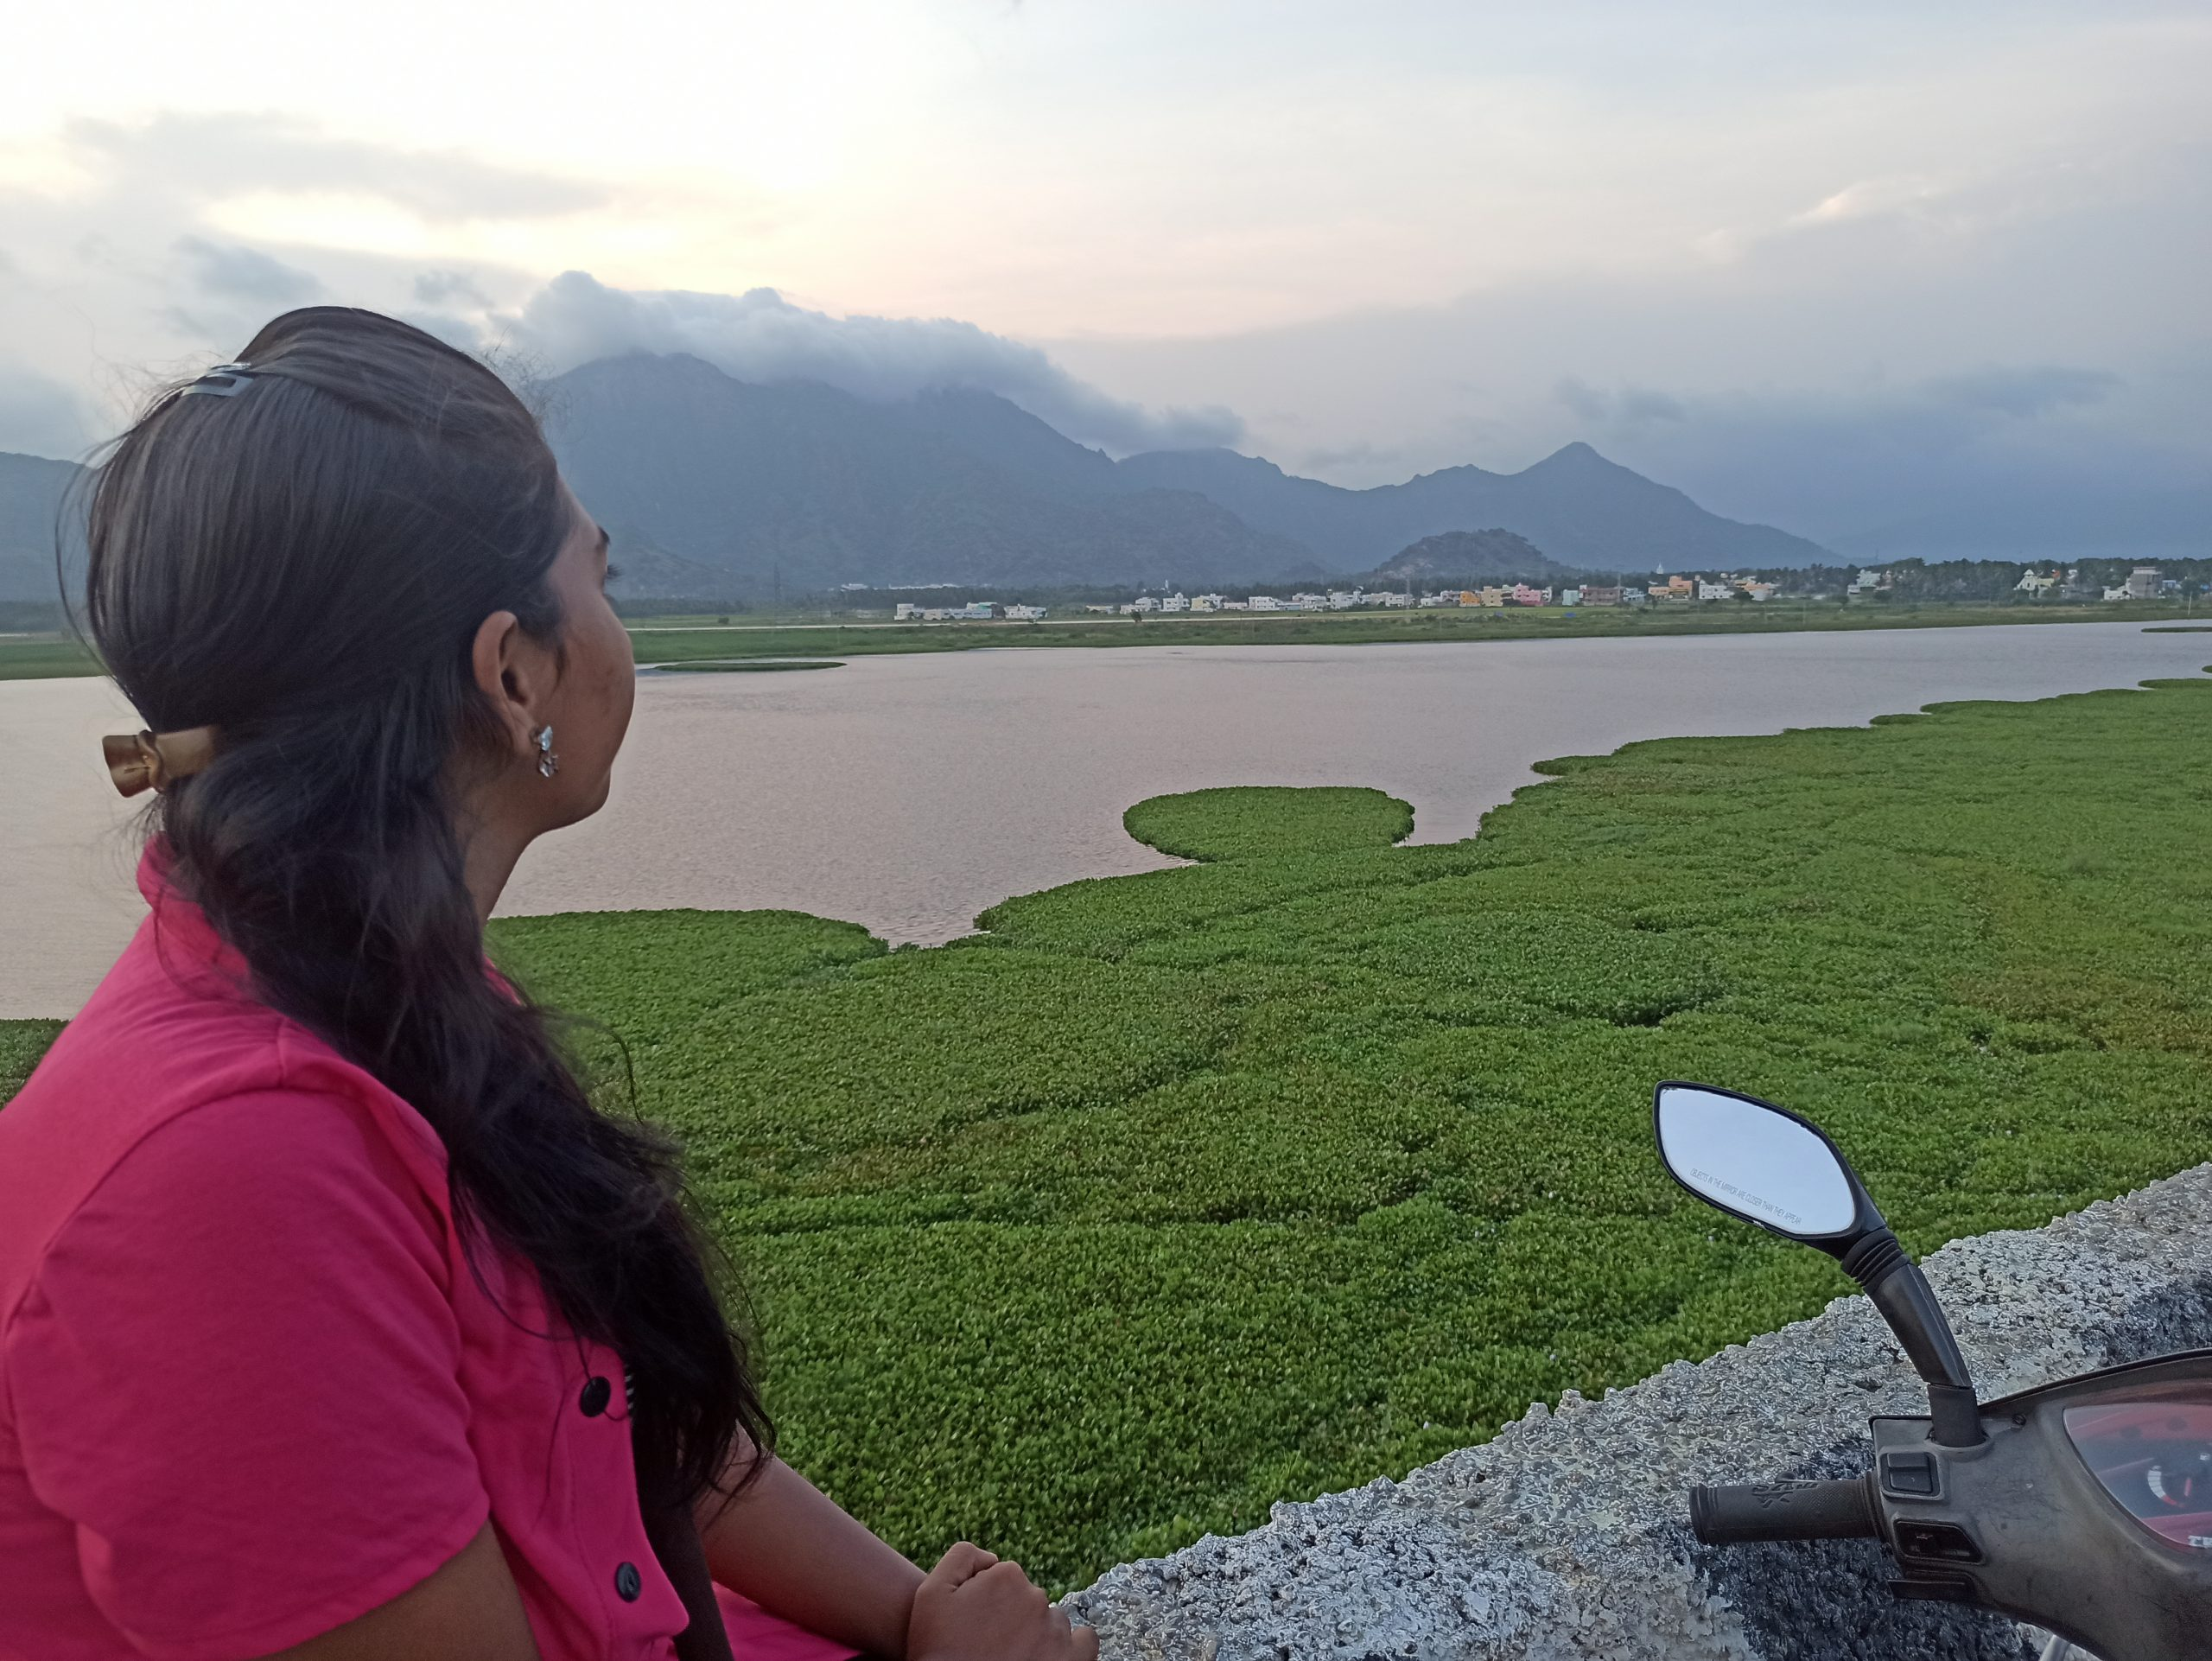 A girl admiring the beauty a Lake